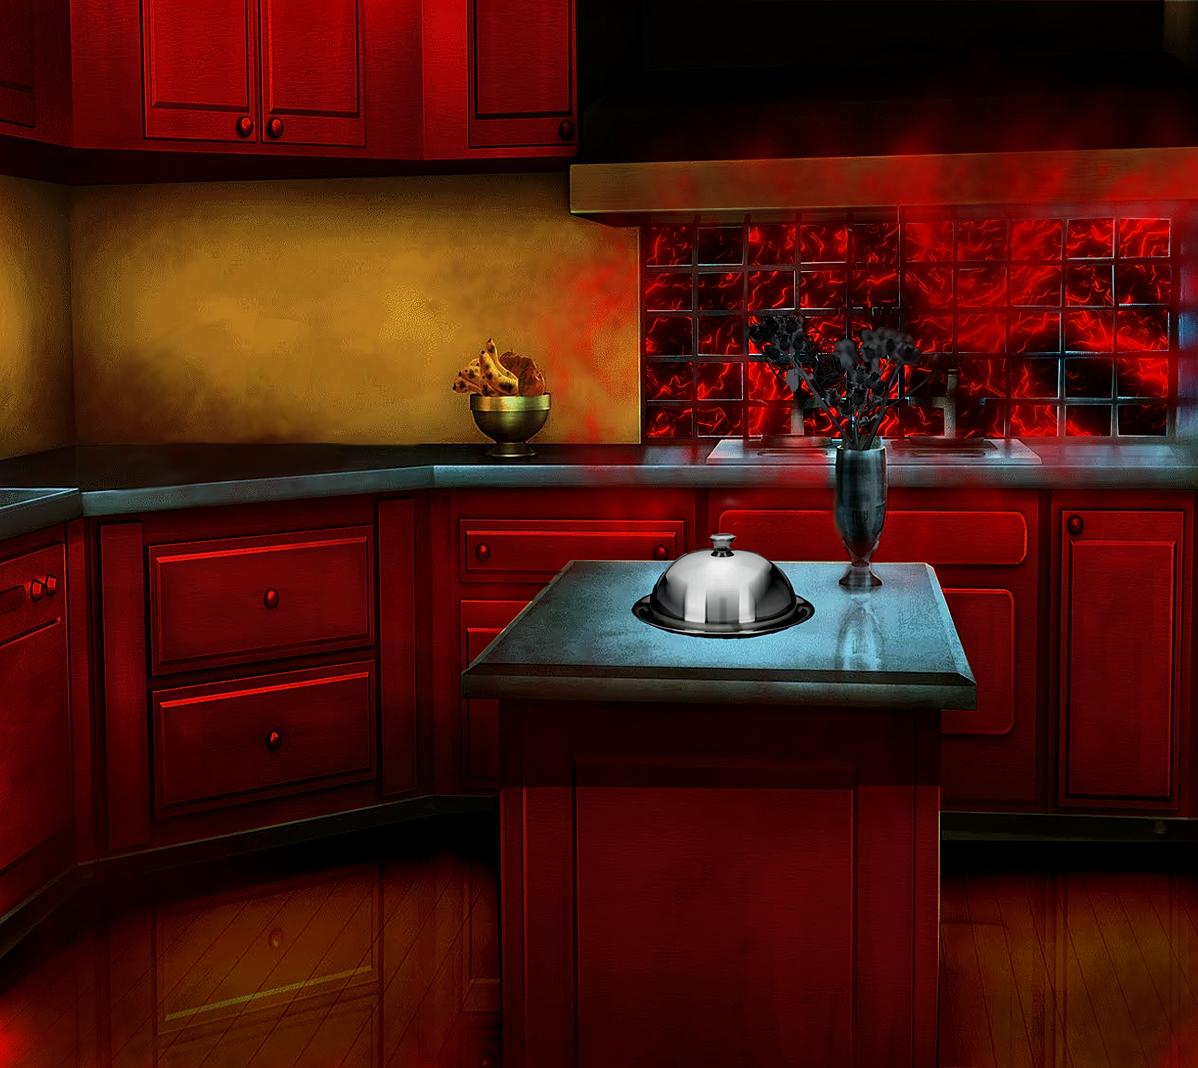 Eyesofrain backgrounds for Furniture hell s kitchen